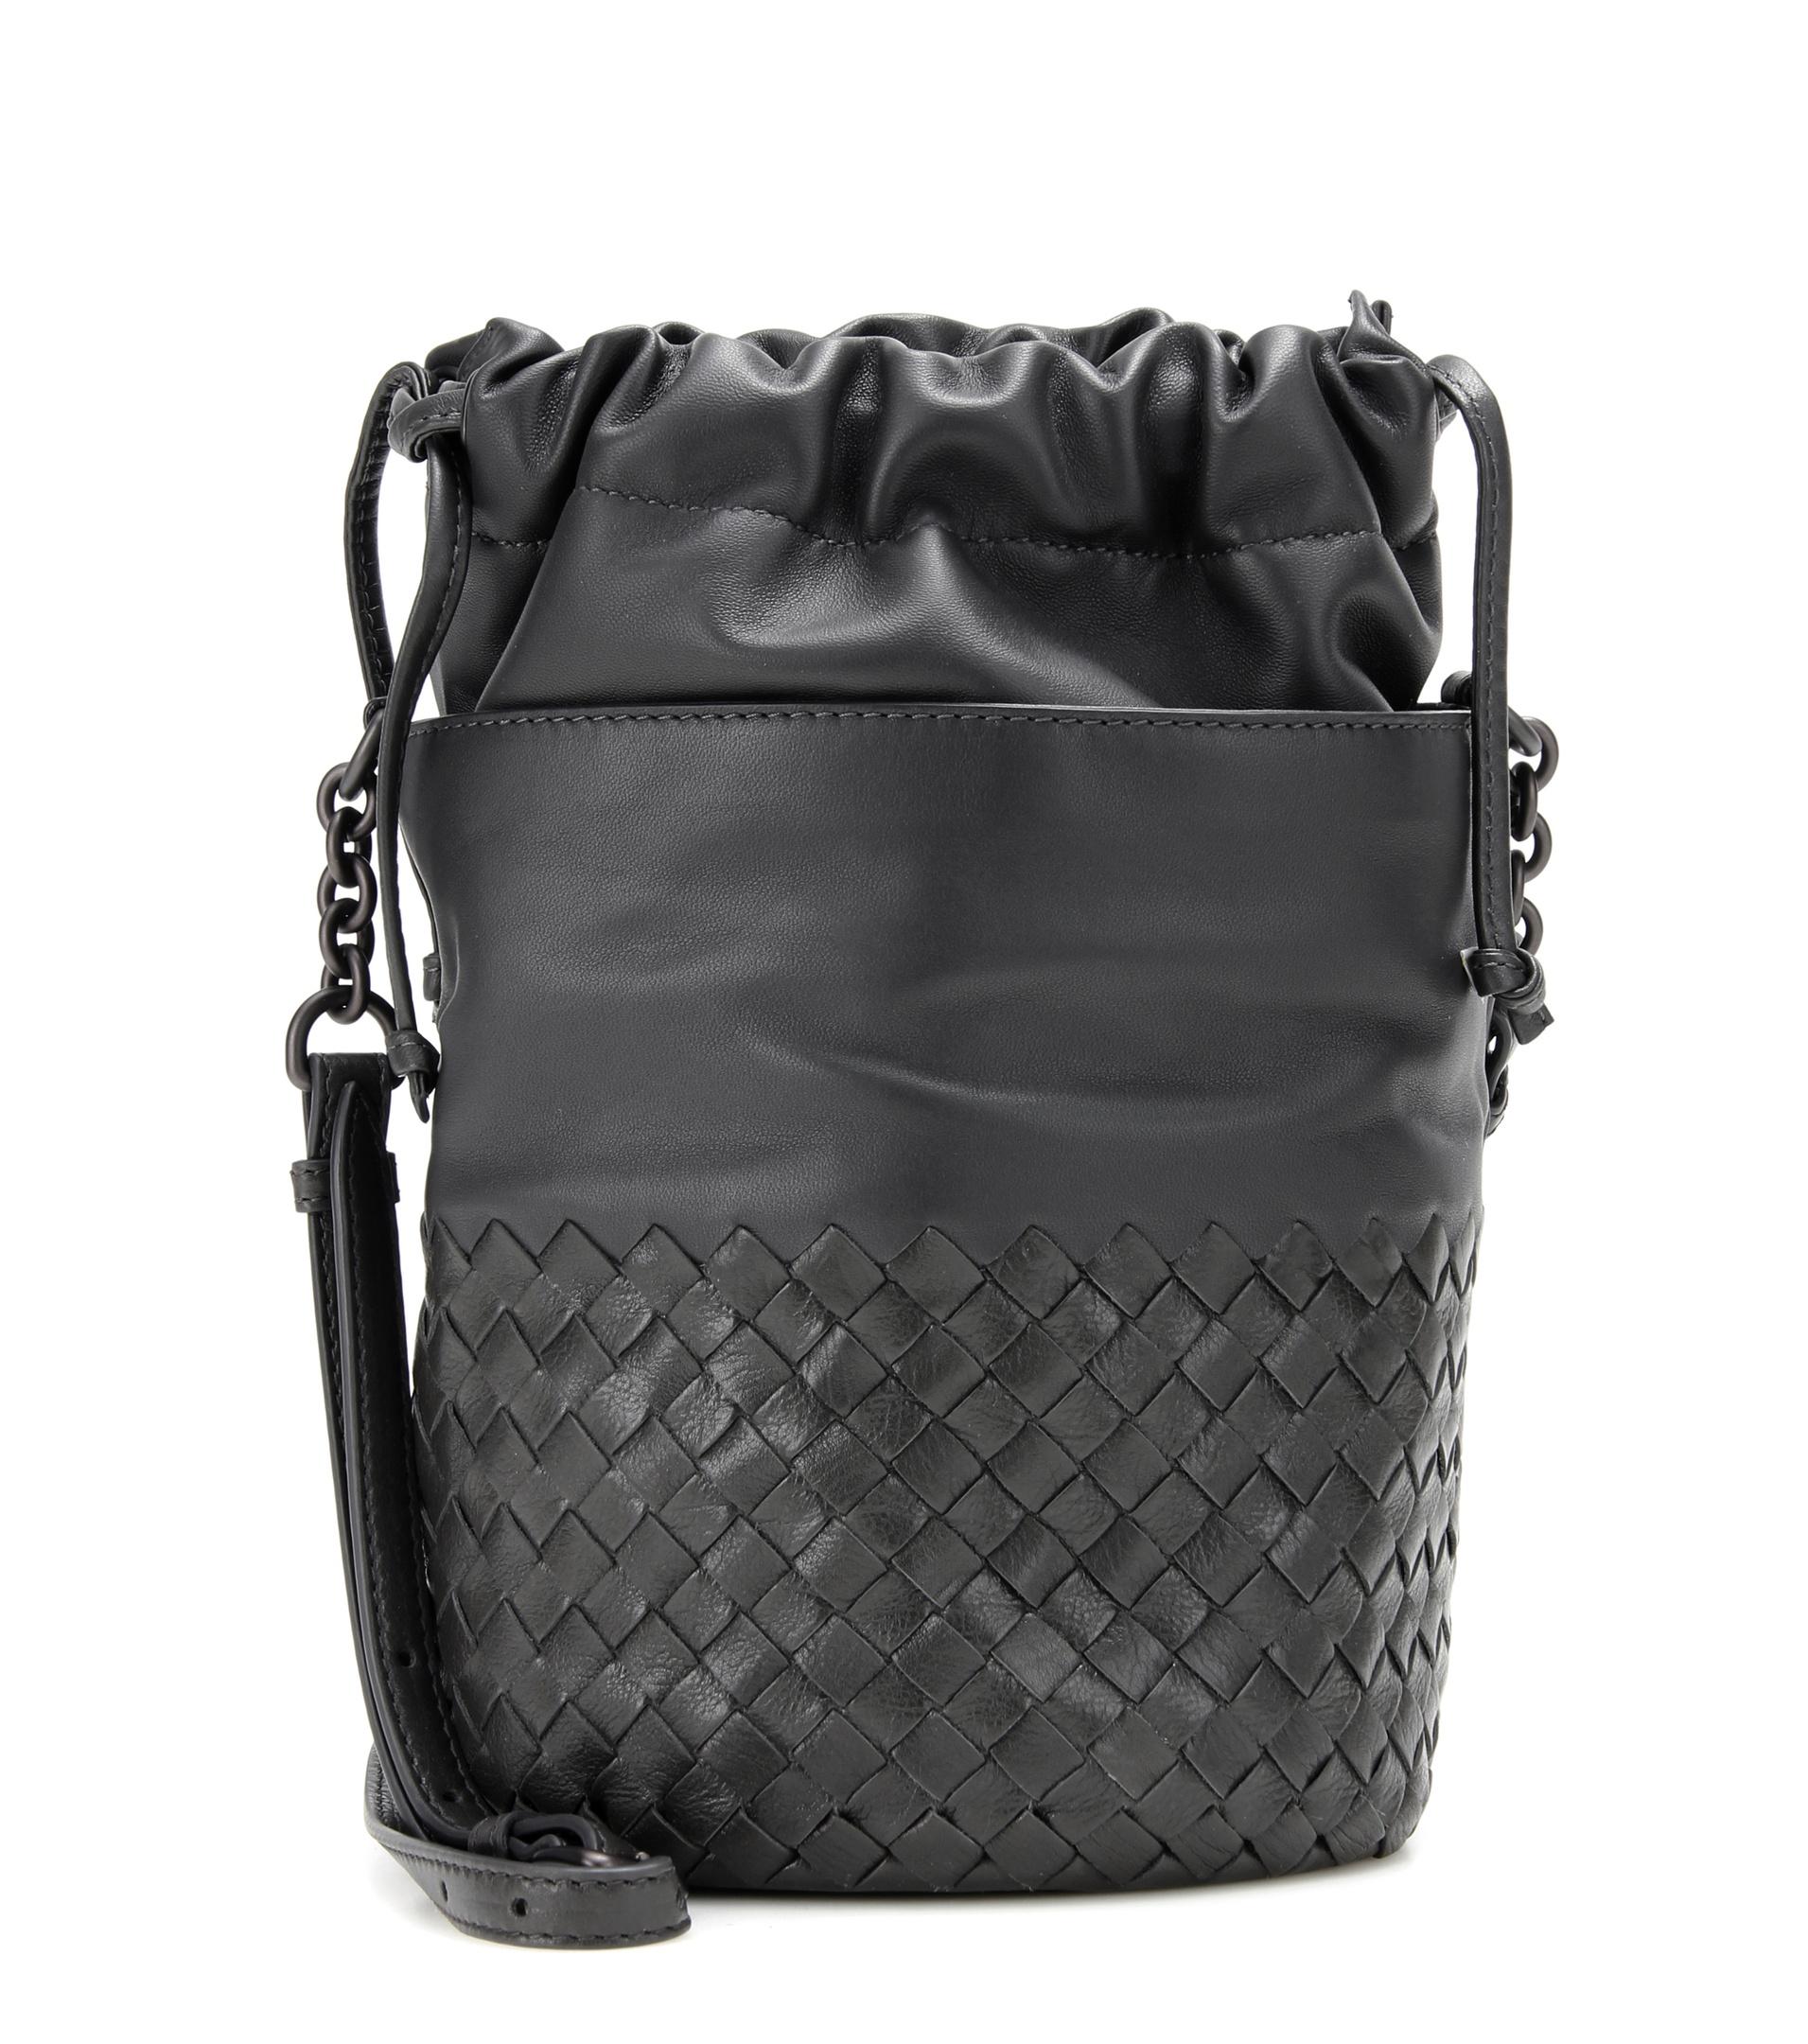 Borse Estate Bottega Veneta : Bottega veneta small bucket leather shoulder bag in black